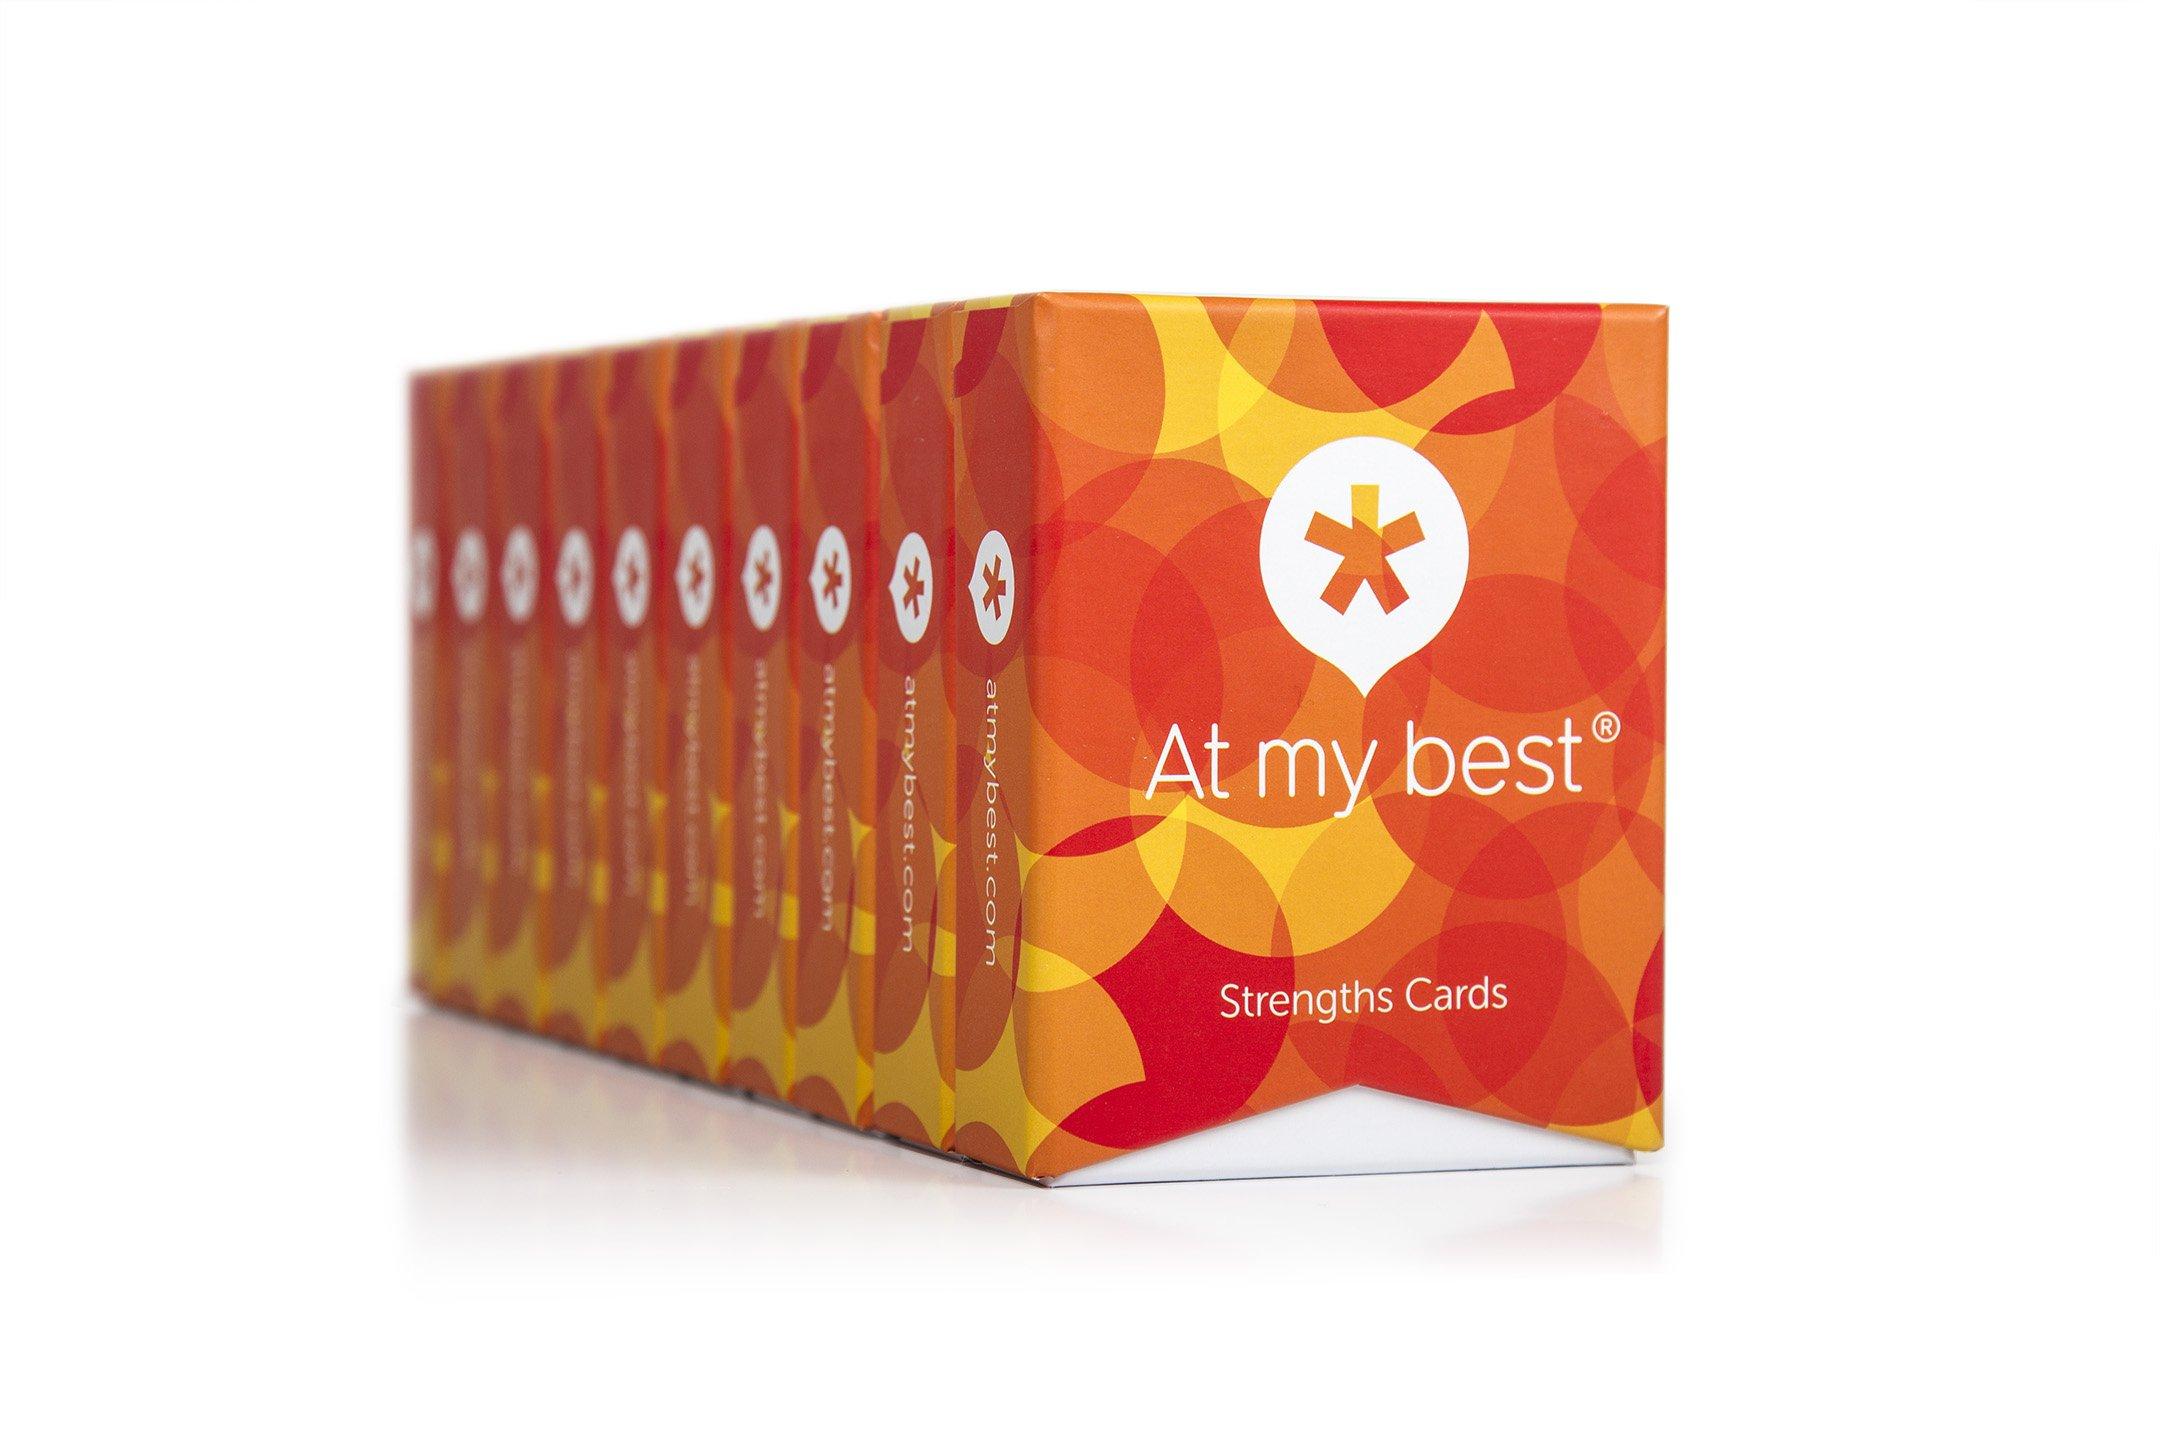 Strengths Cards (10 Pack Bundle)